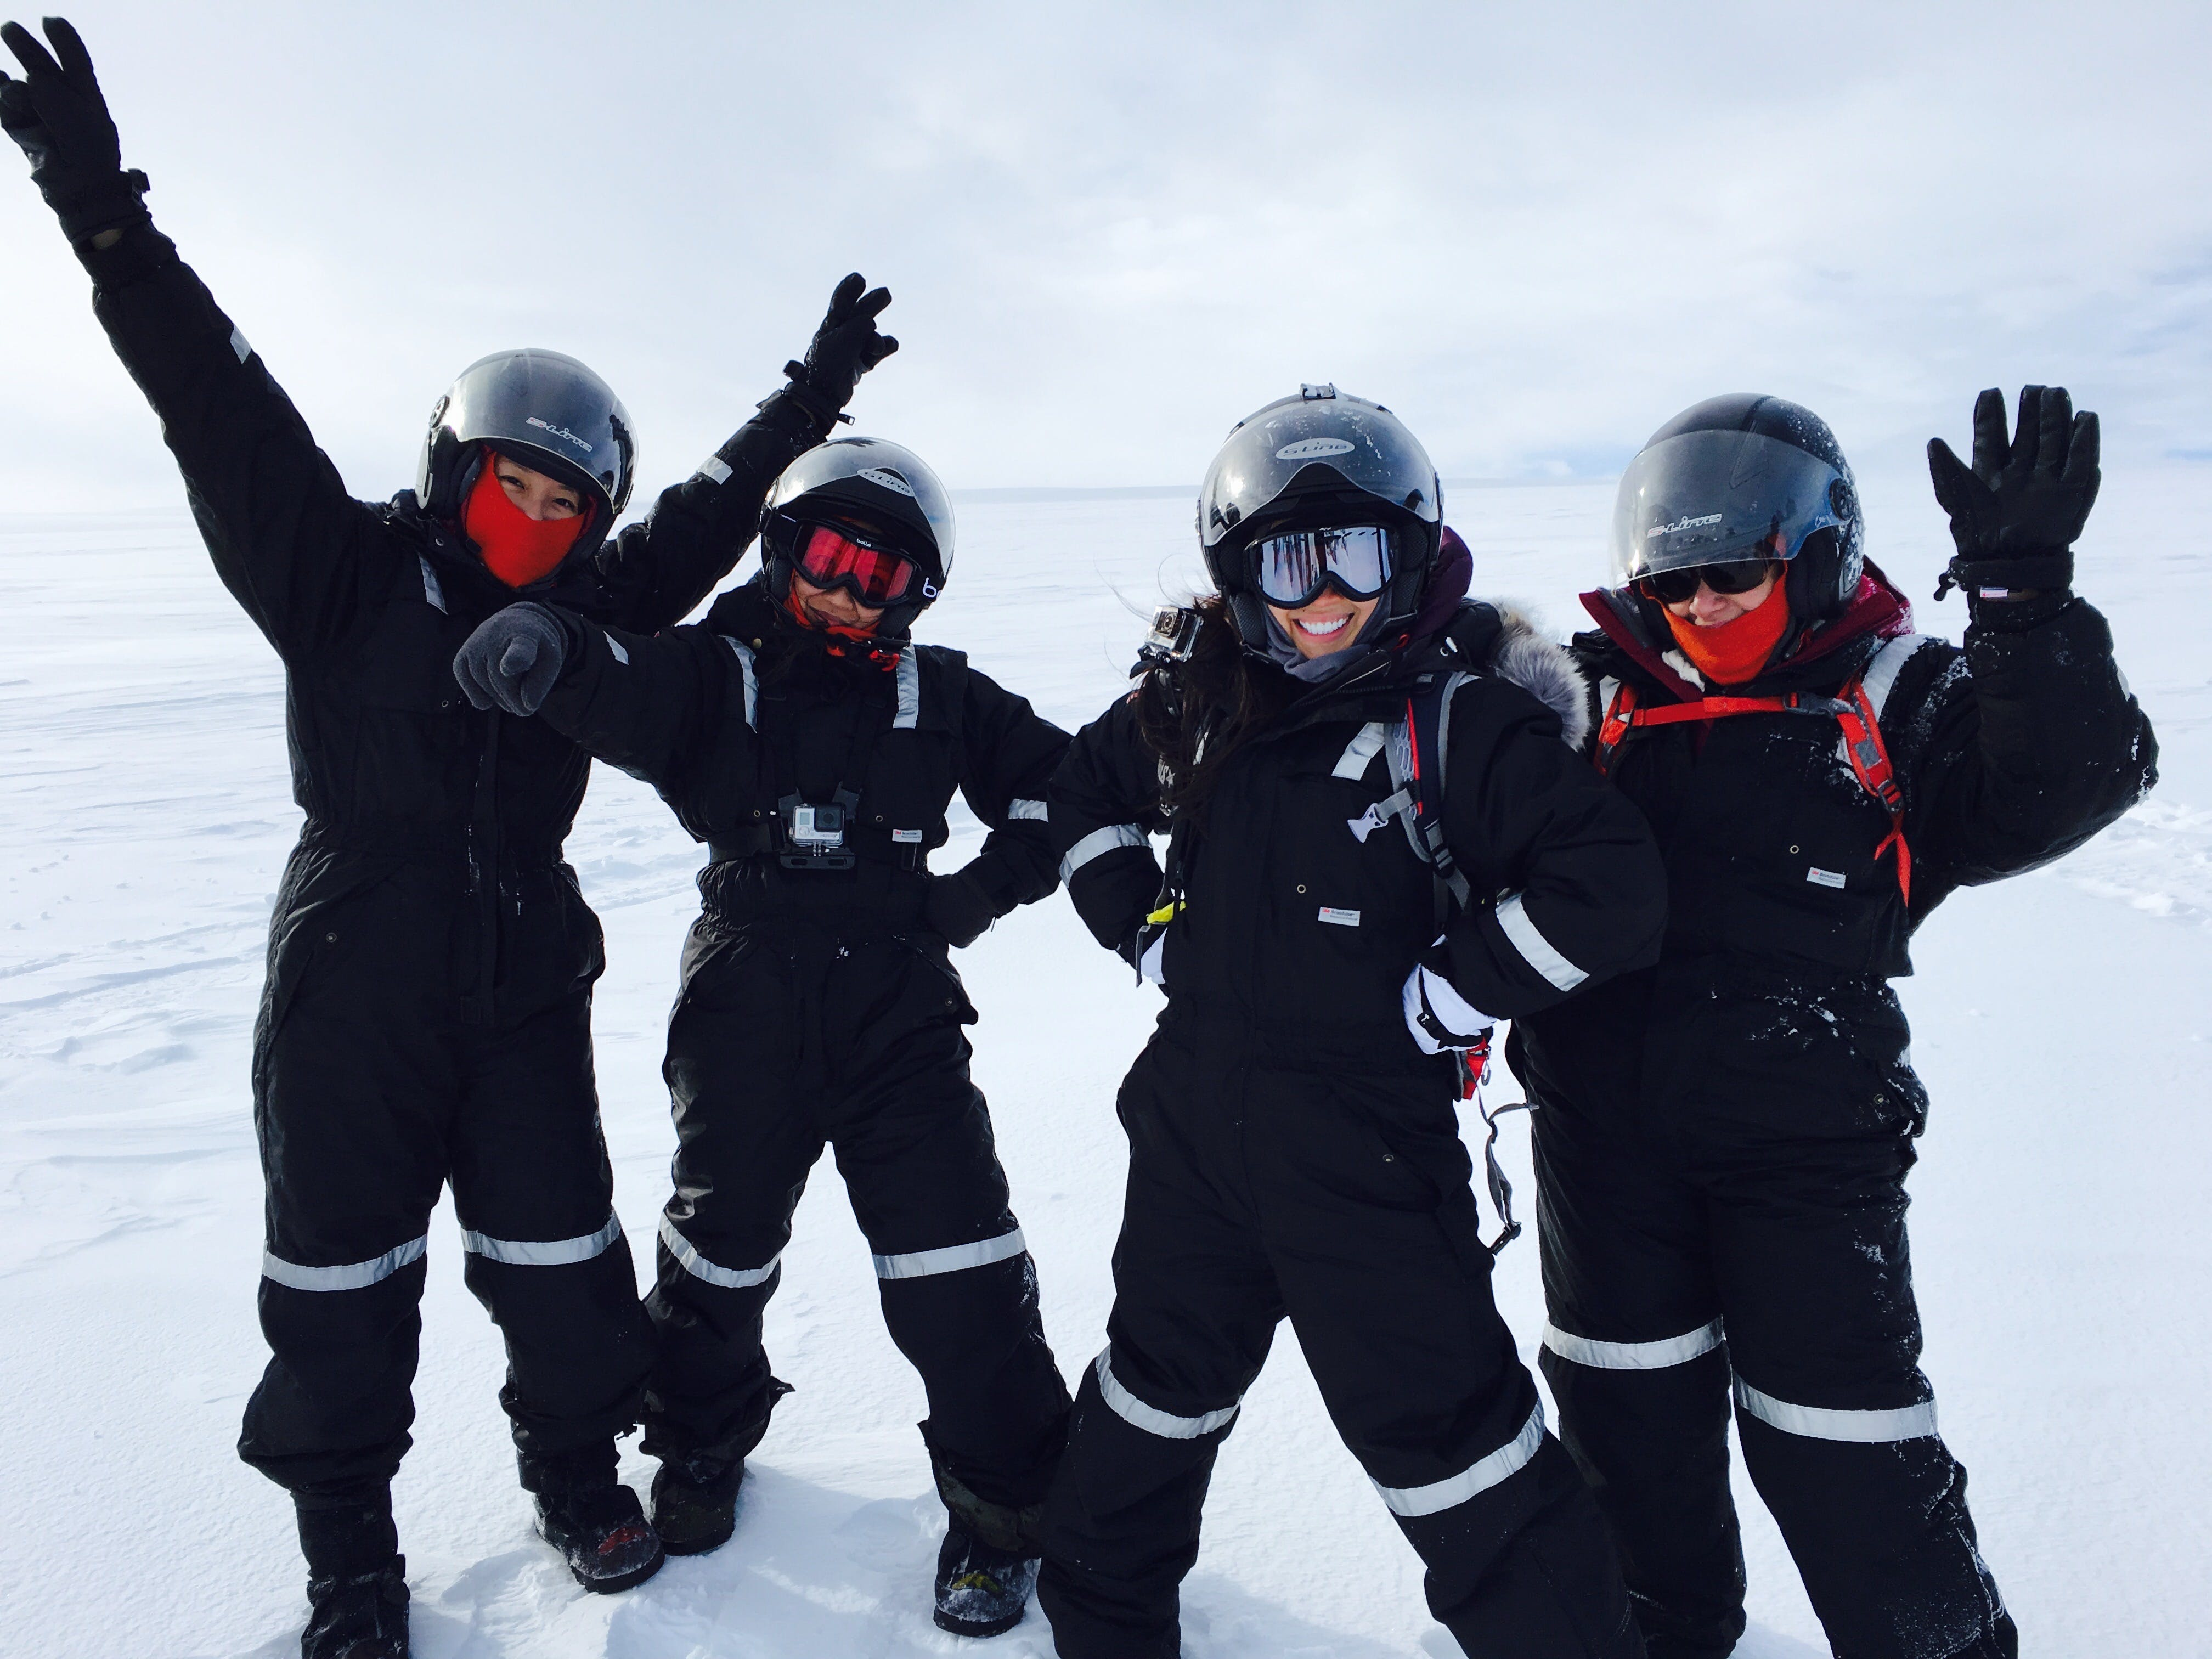 Four Person Wearing Black Snow Suit